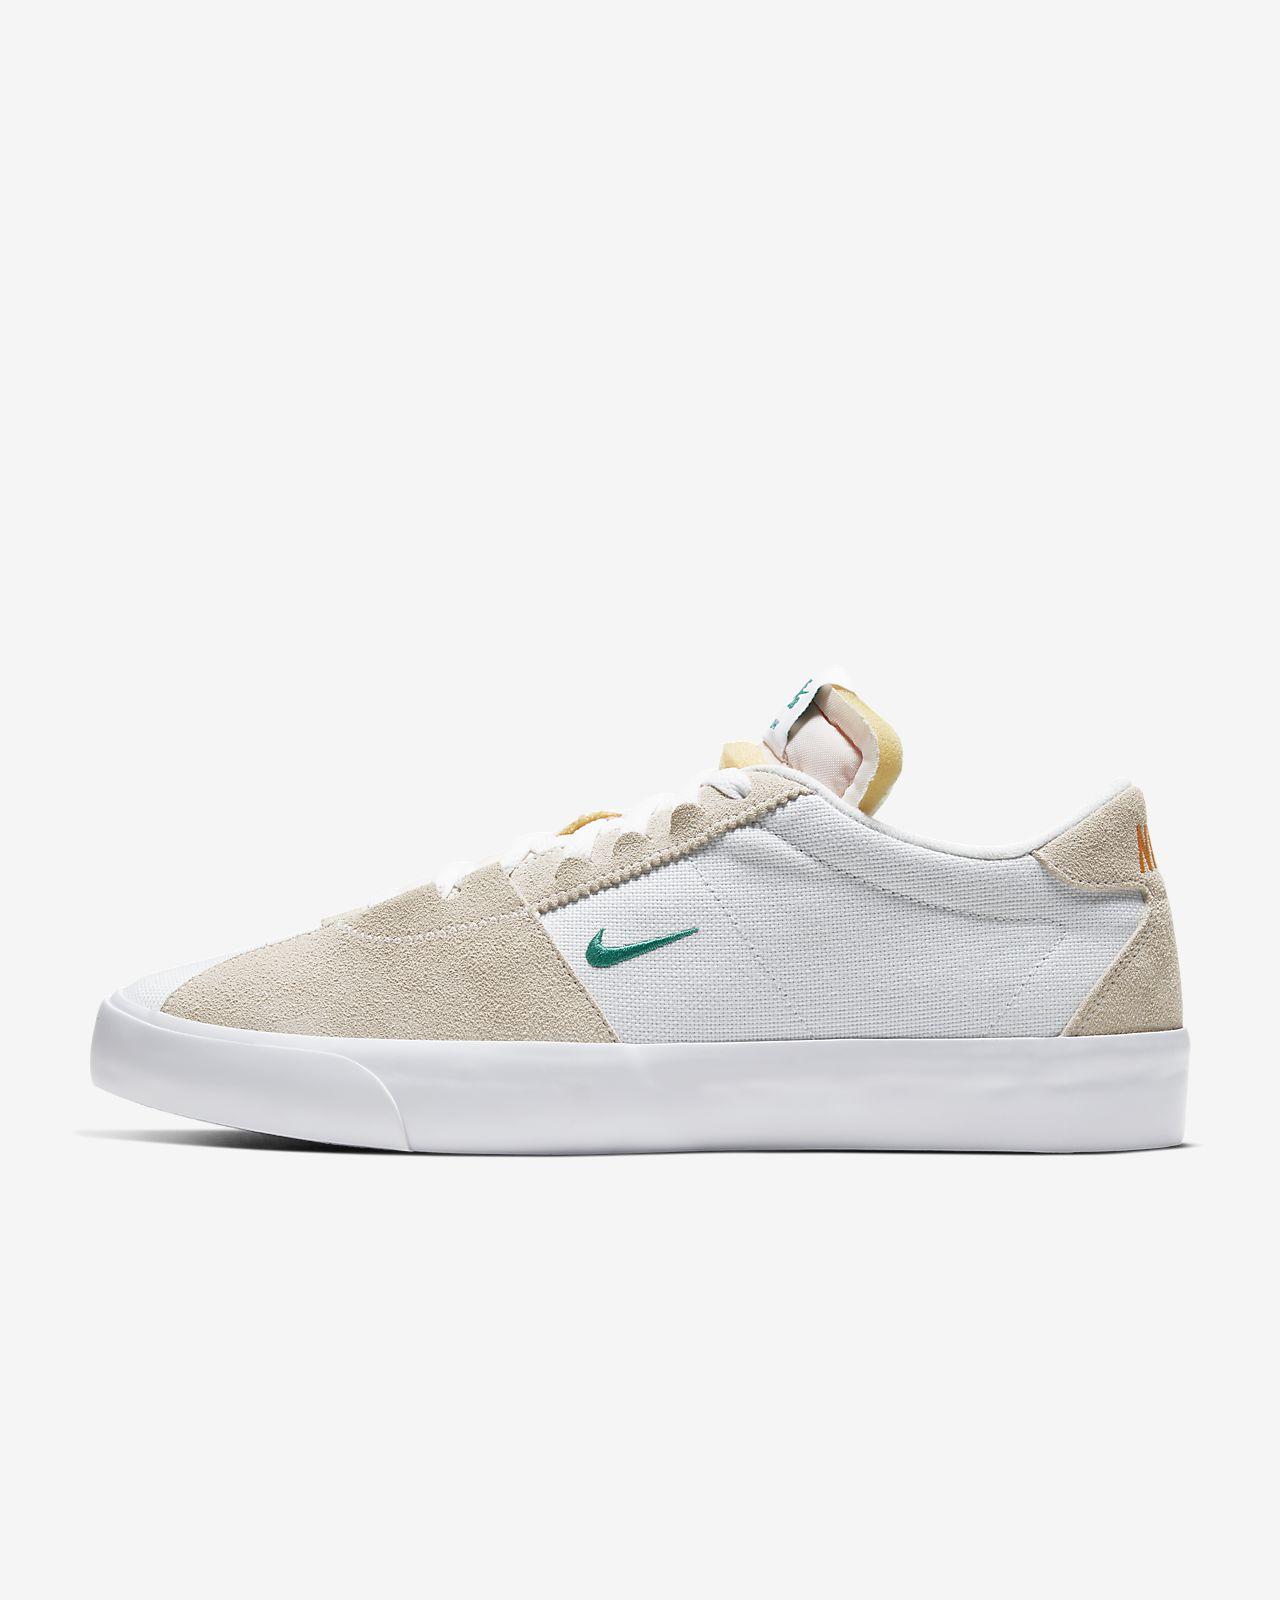 Nike SB Dunk Low Pro PRM   Hvit   Skatesko   CJ6884 100